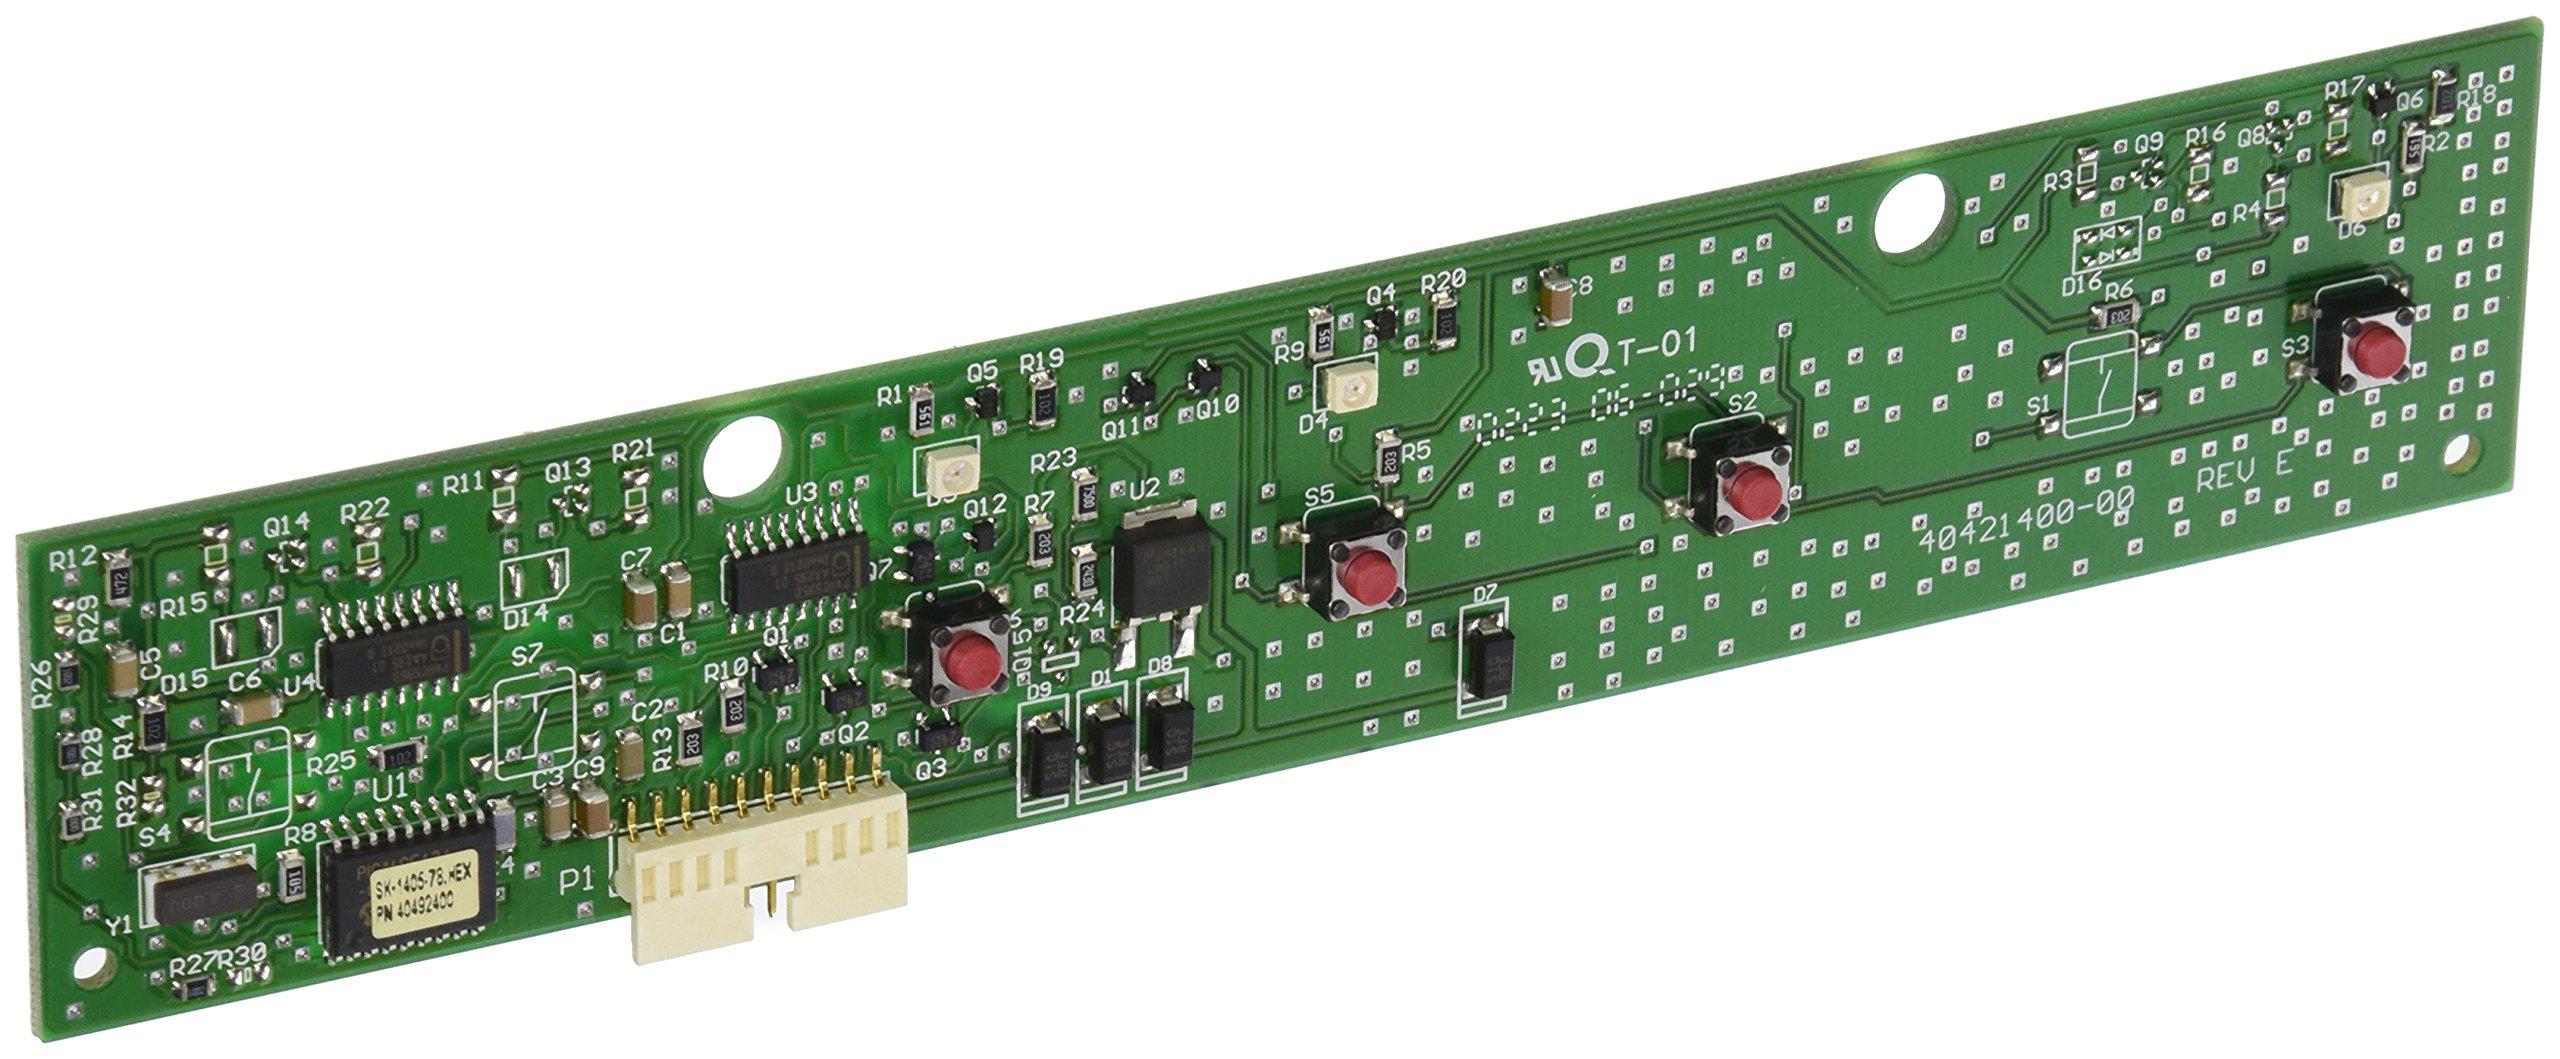 Frigidaire 241700102 Refrigerator Main Control Board